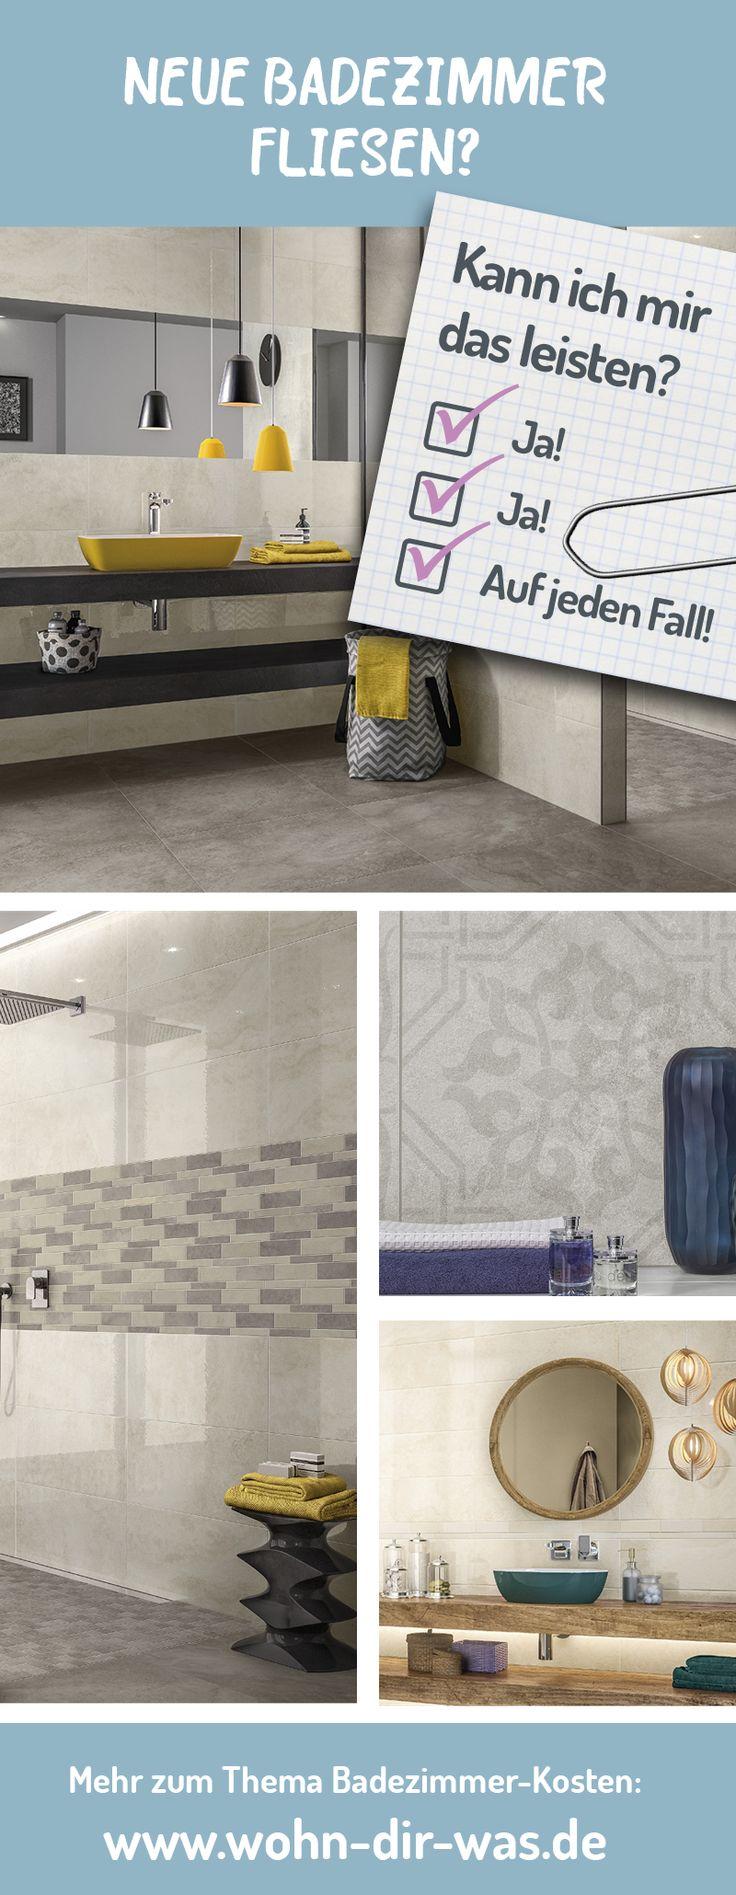 398 best Fliesen-Trends im Bad images on Pinterest | Bath tiles ...